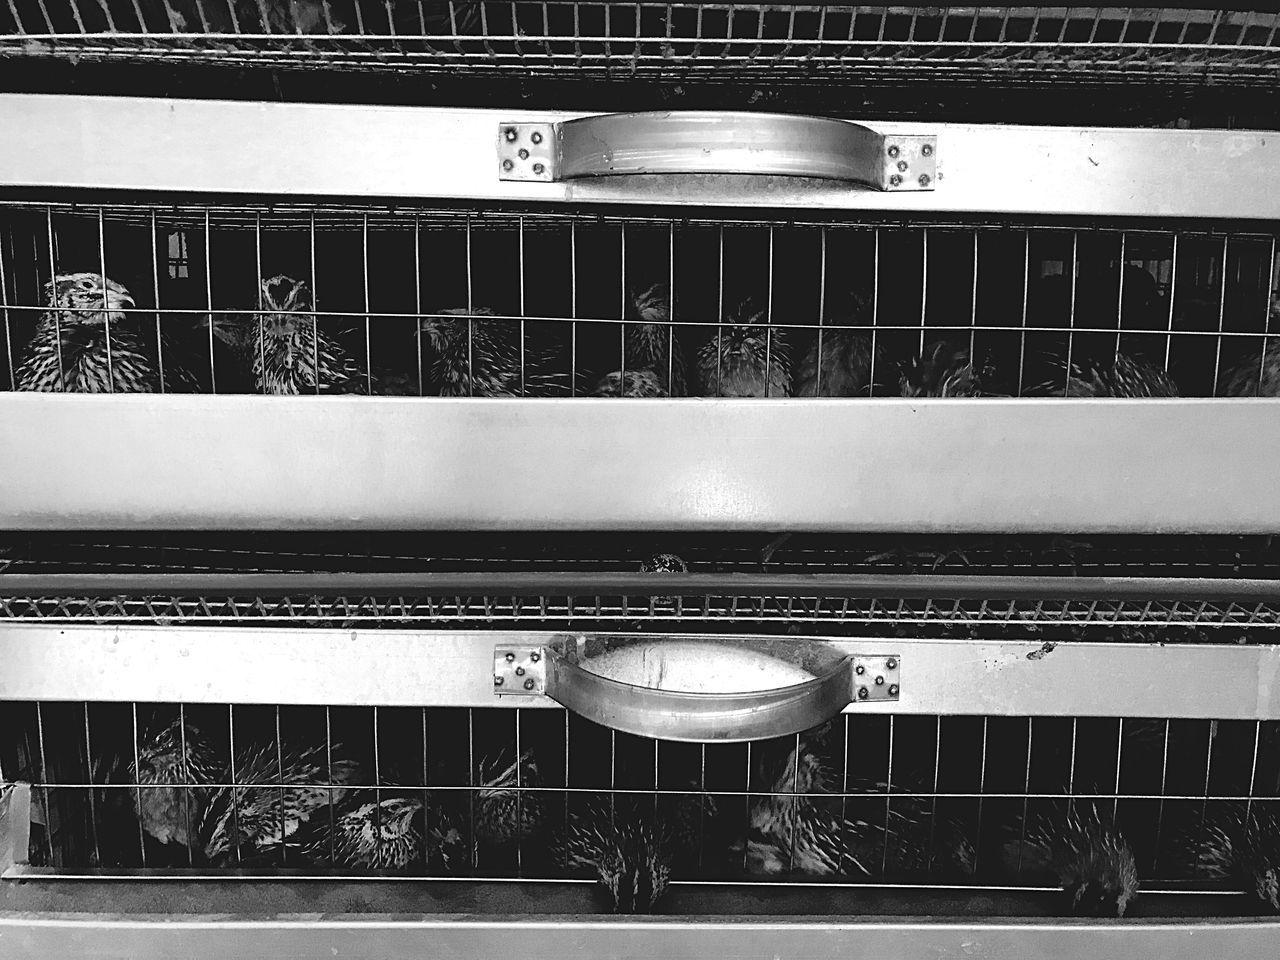 Rail Transportation Indoors  No People Transportation Day Village Village Life Black & White Photography Domestic Animals Перепелки клетка ферма деревня жестокость птицы в клетке Еда перепелиные яйца яйца Summer